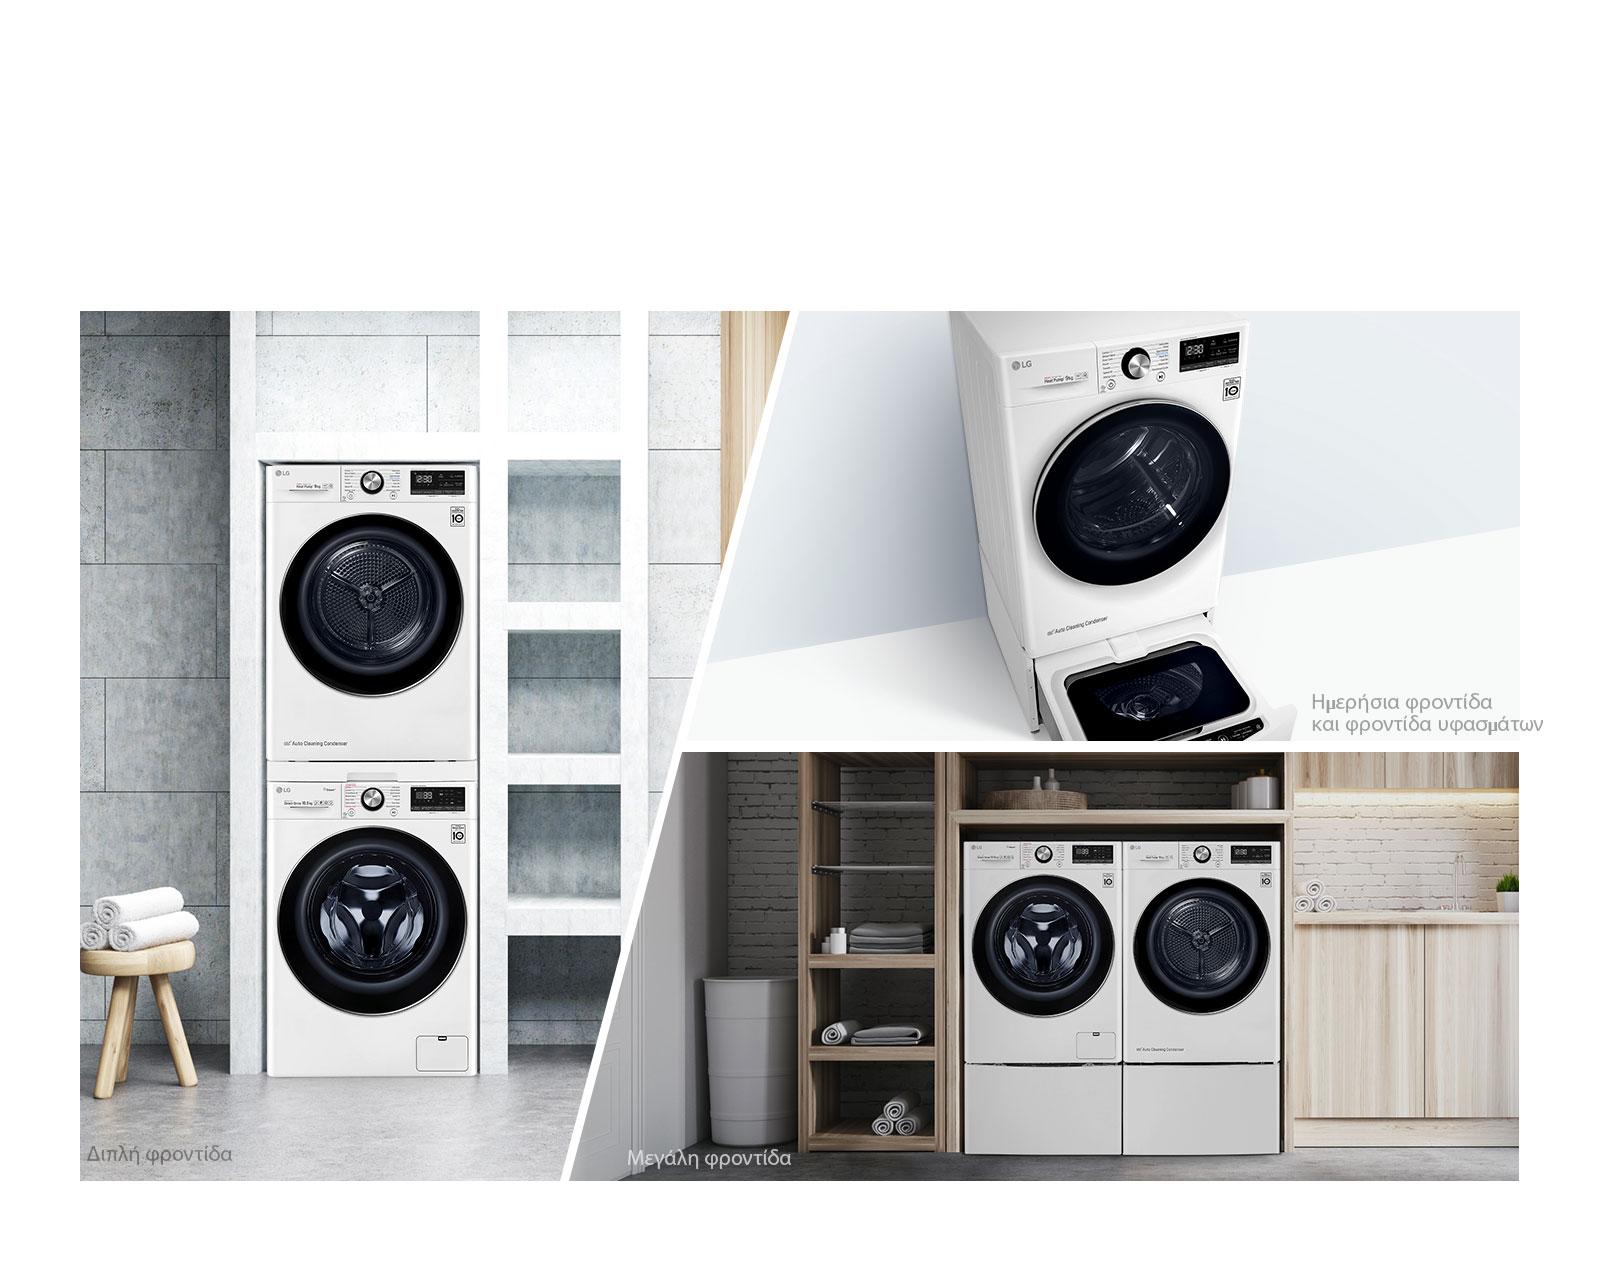 Dryer-EU-Vivace-V900-VC2-White-15-Perfect-Care-D_v